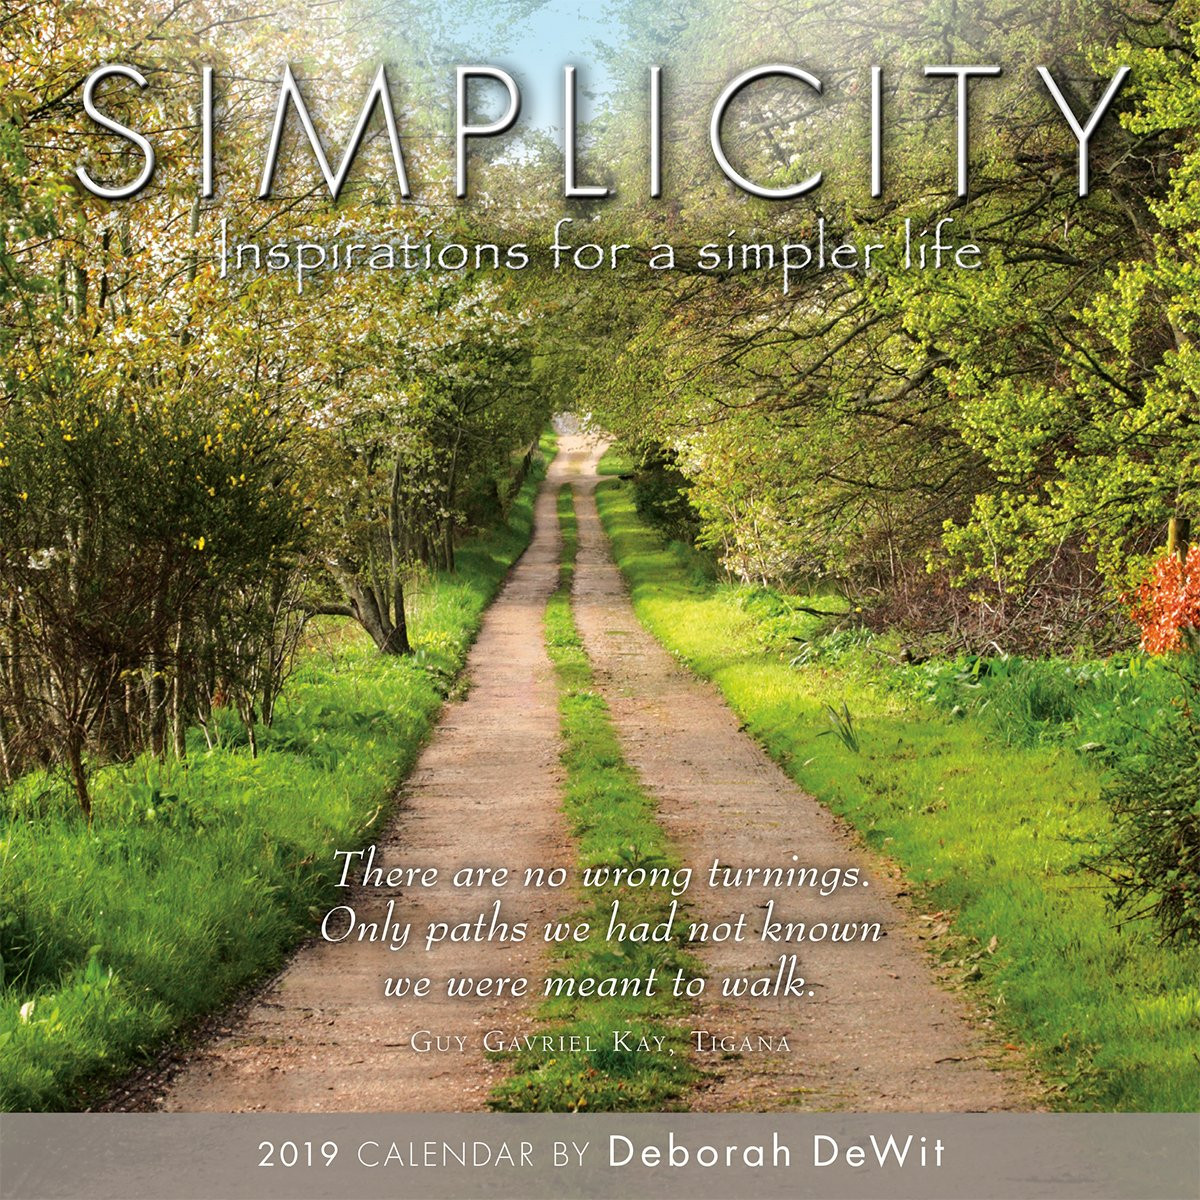 2019 Simplicity — Inspiration for a Simpler Life Mini Calendar: by Sellers Publishing, 7x7 (CS-0470) Calendar – Mini Calendar, Jun 22 2018 Deborah DeWit Inc. 153190470X /